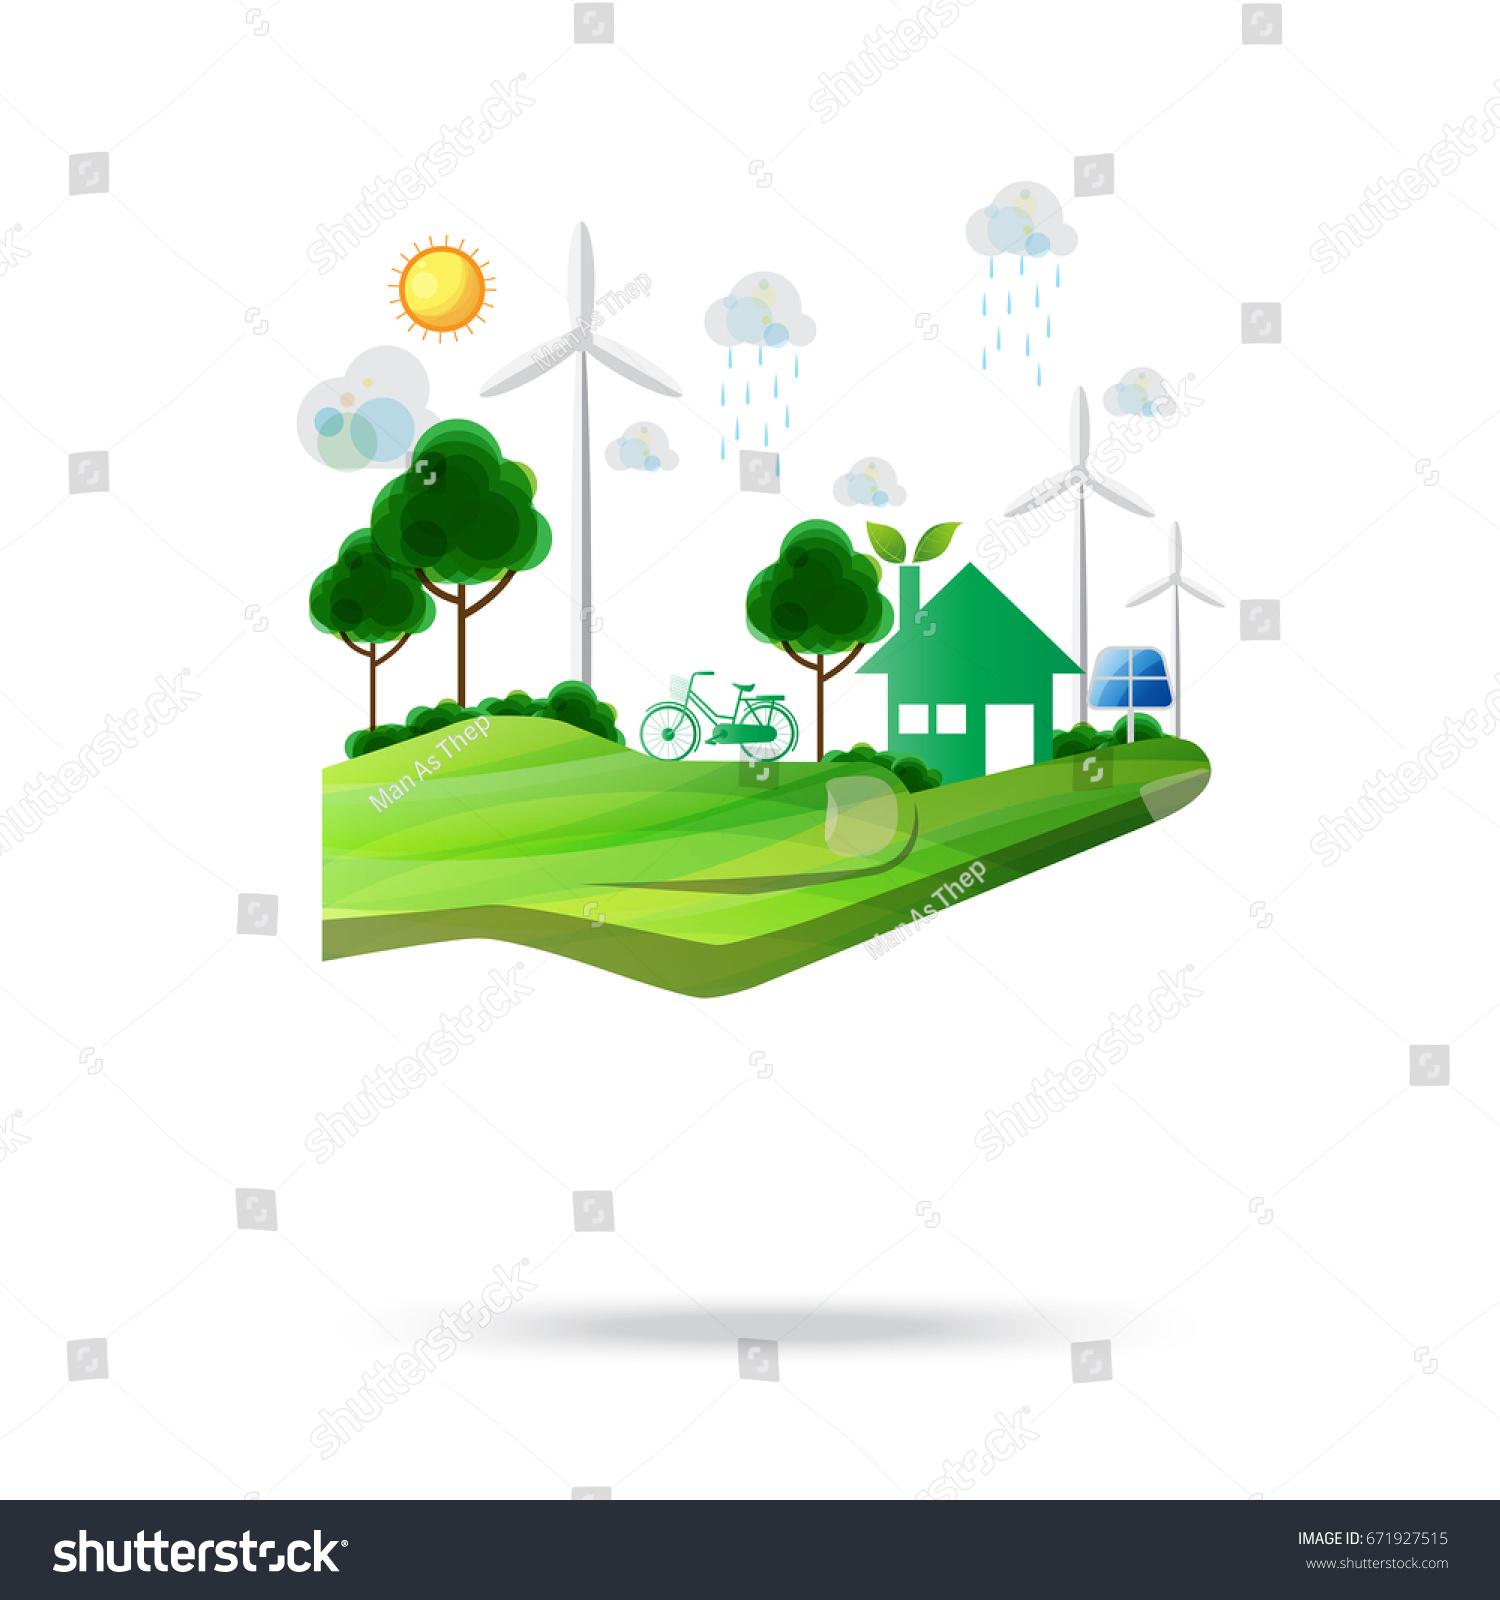 Environmental Concept Earthfriendly Landscapes: Renewable Energy Conceptual Ideanature Eco Friendly Stock